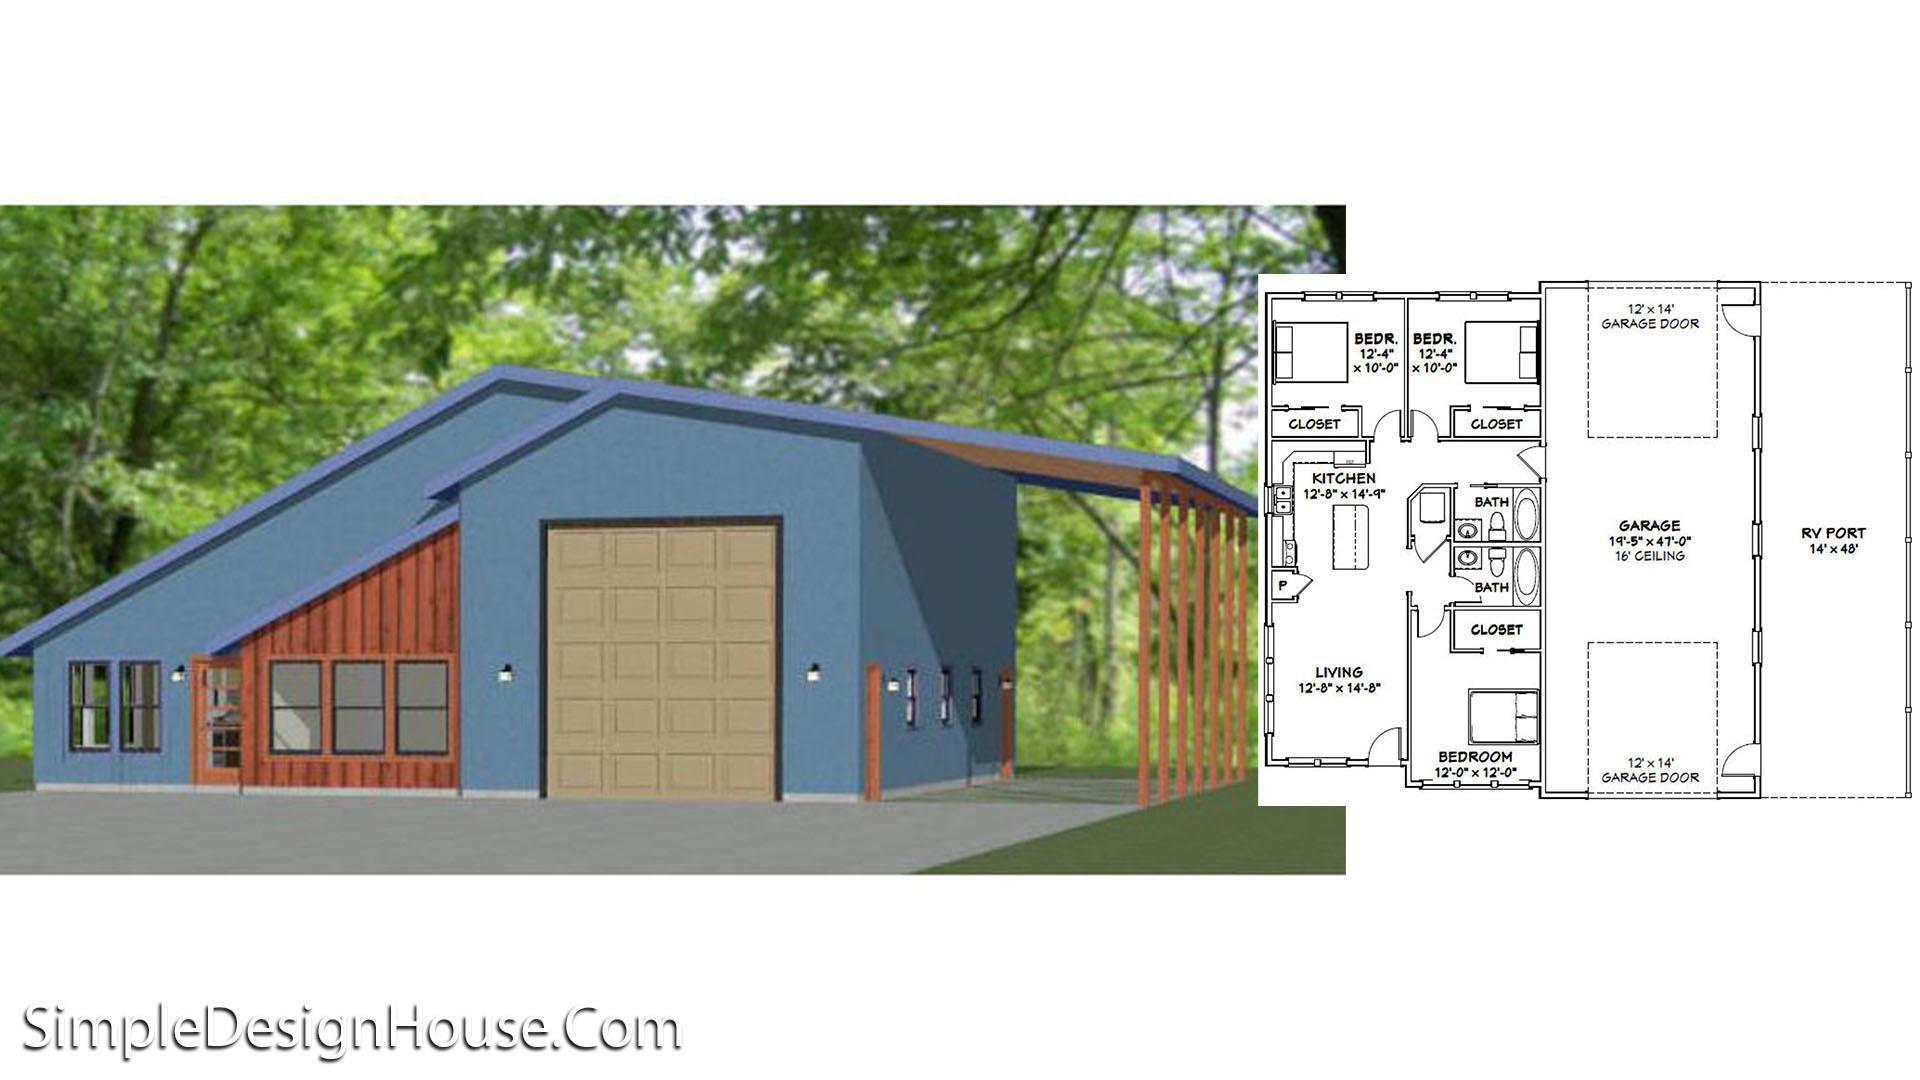 46×48 House Plans 3 Beds 1,157 sq ft PDF Floor Plan